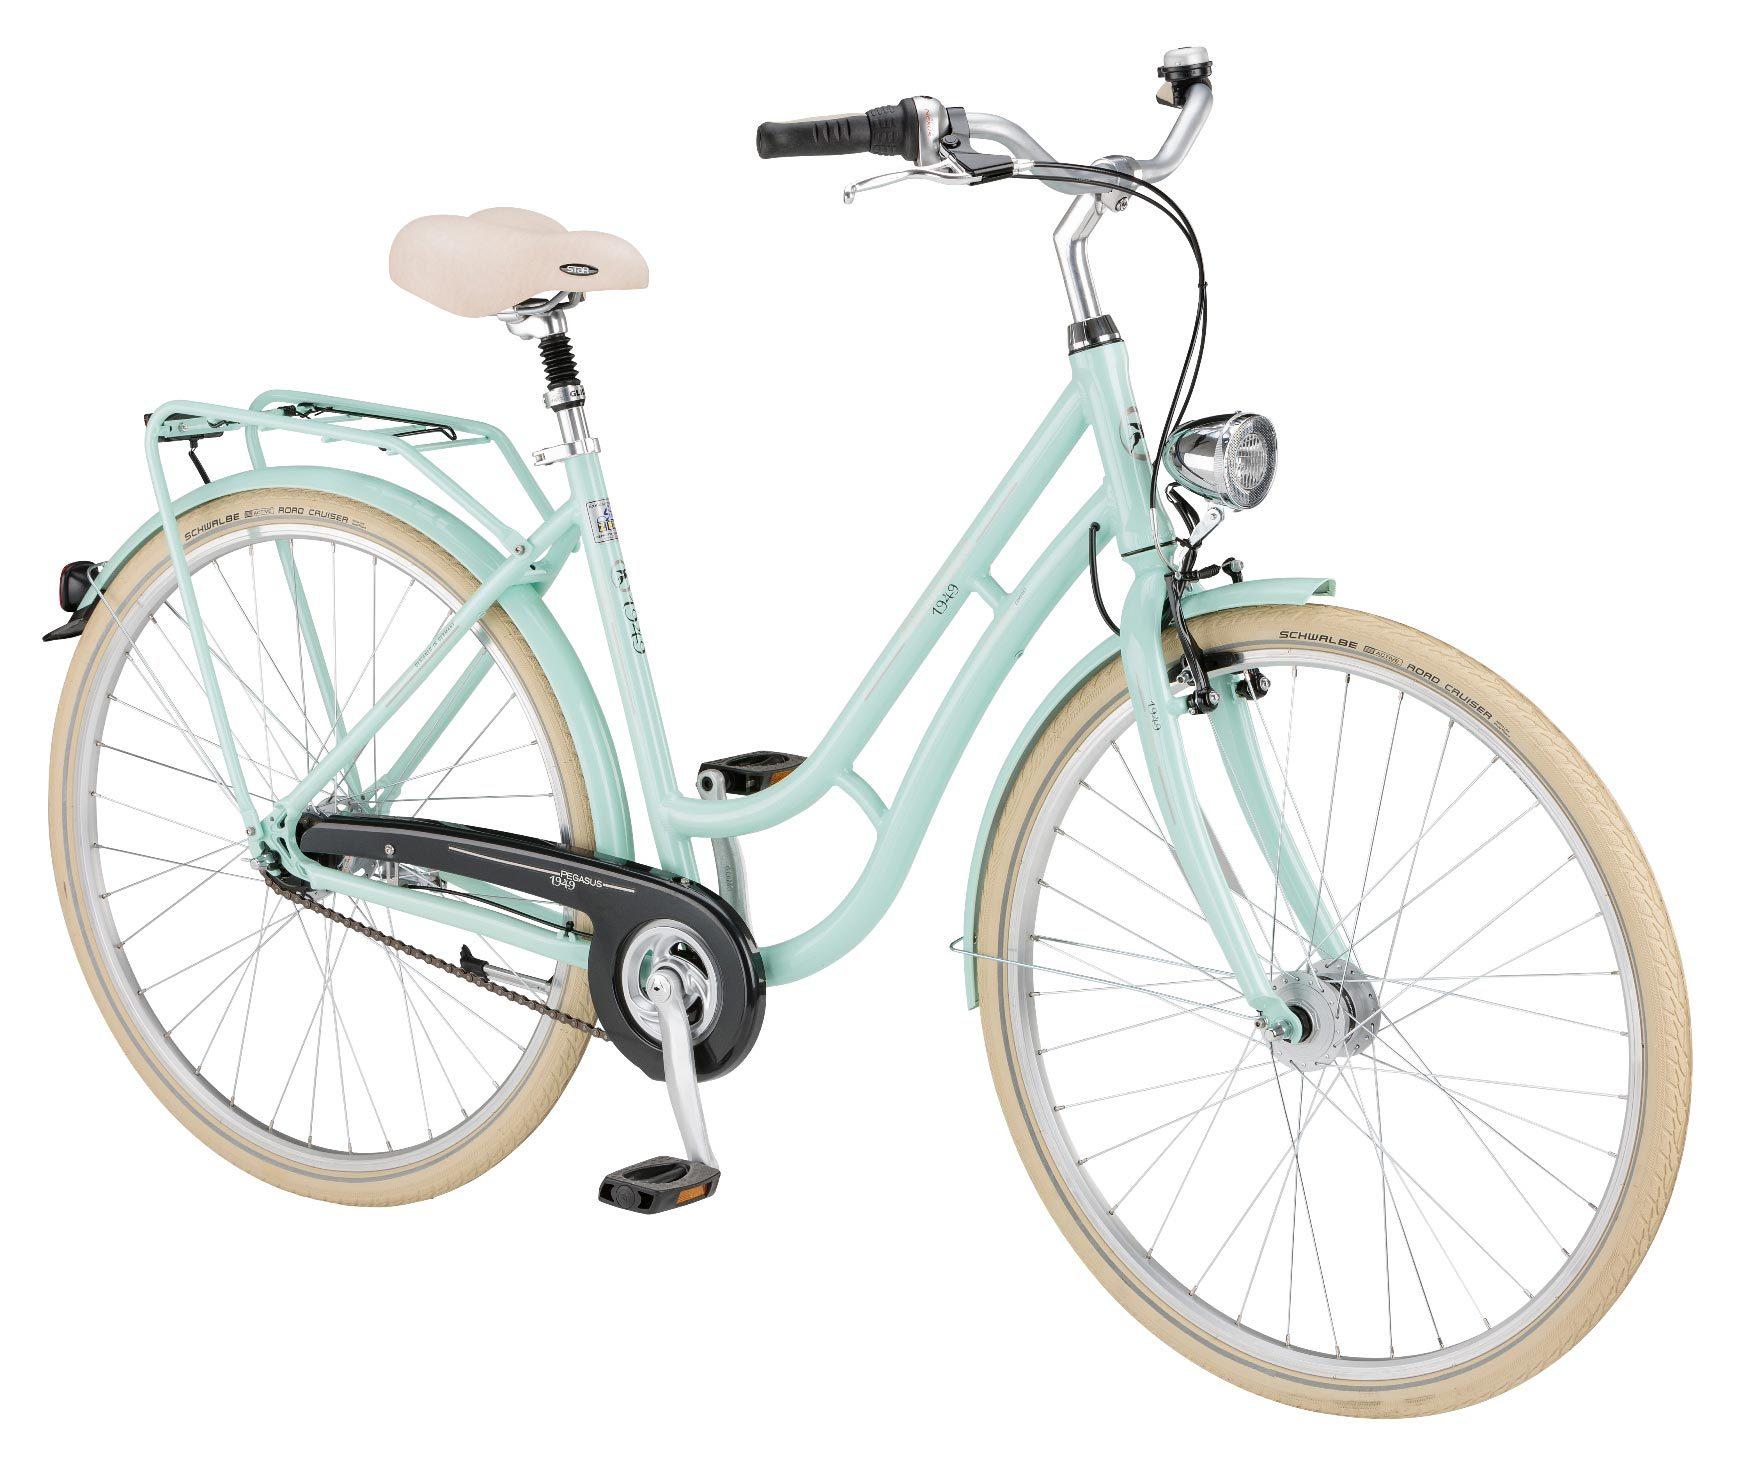 citybike pegasus 1949 28 zoll stadt fahrrad mint 50 cm. Black Bedroom Furniture Sets. Home Design Ideas